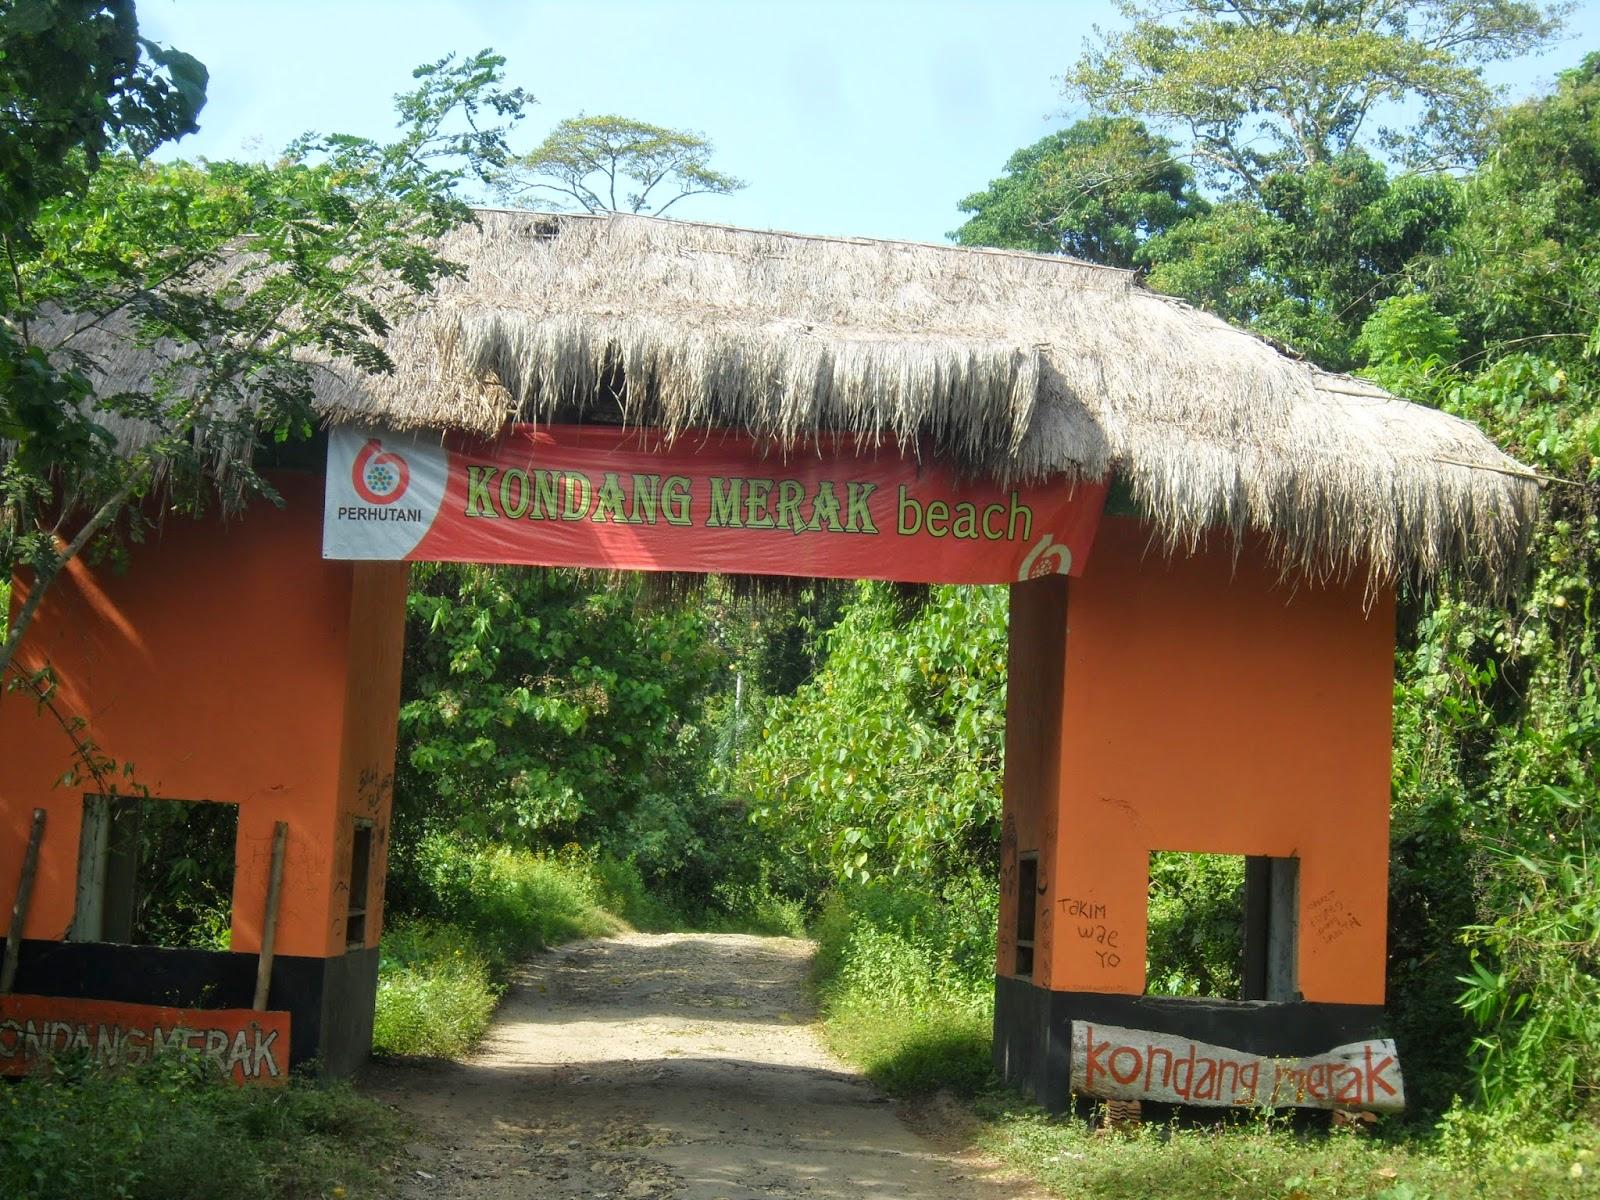 Seratusnegara Pantai Kondang Merak Nggak Perlu Biaya Mahal Sendiri Berada